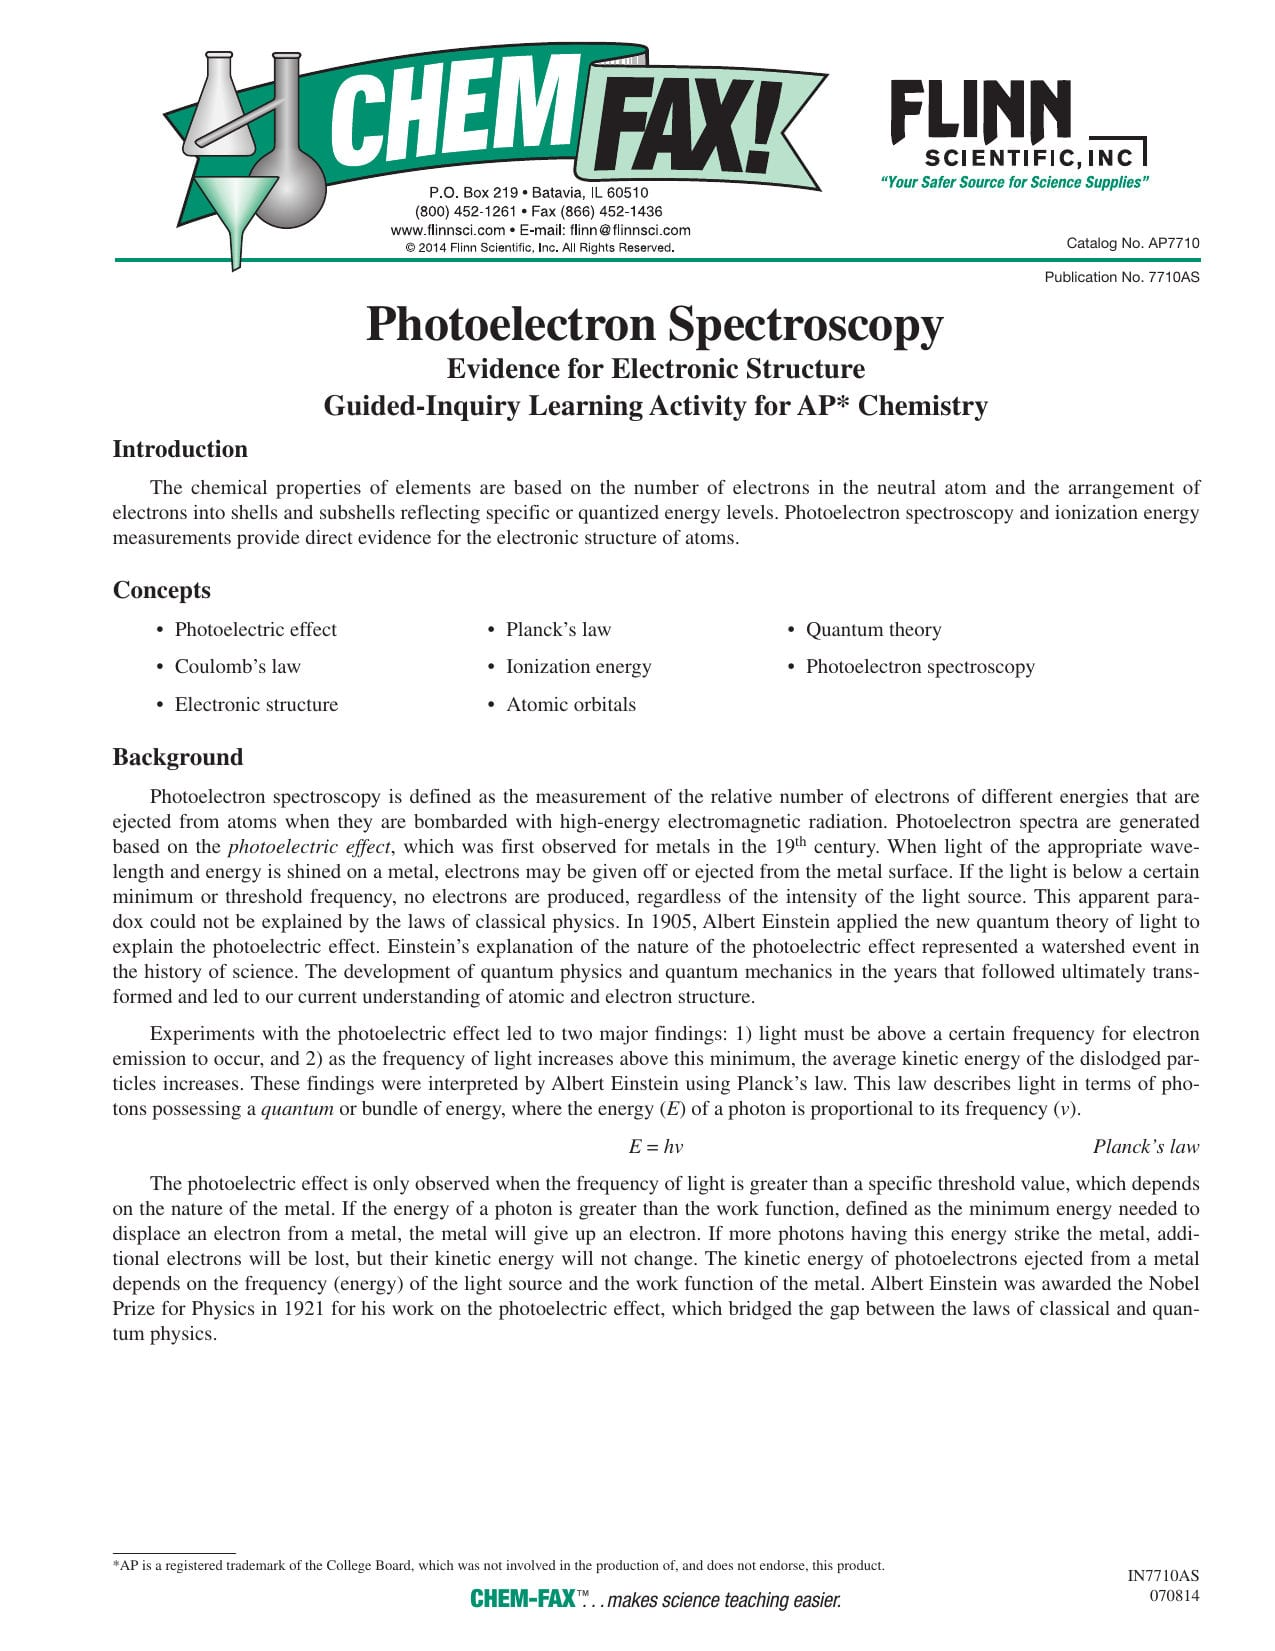 Photoelectron Spectroscopy Worksheet Answers